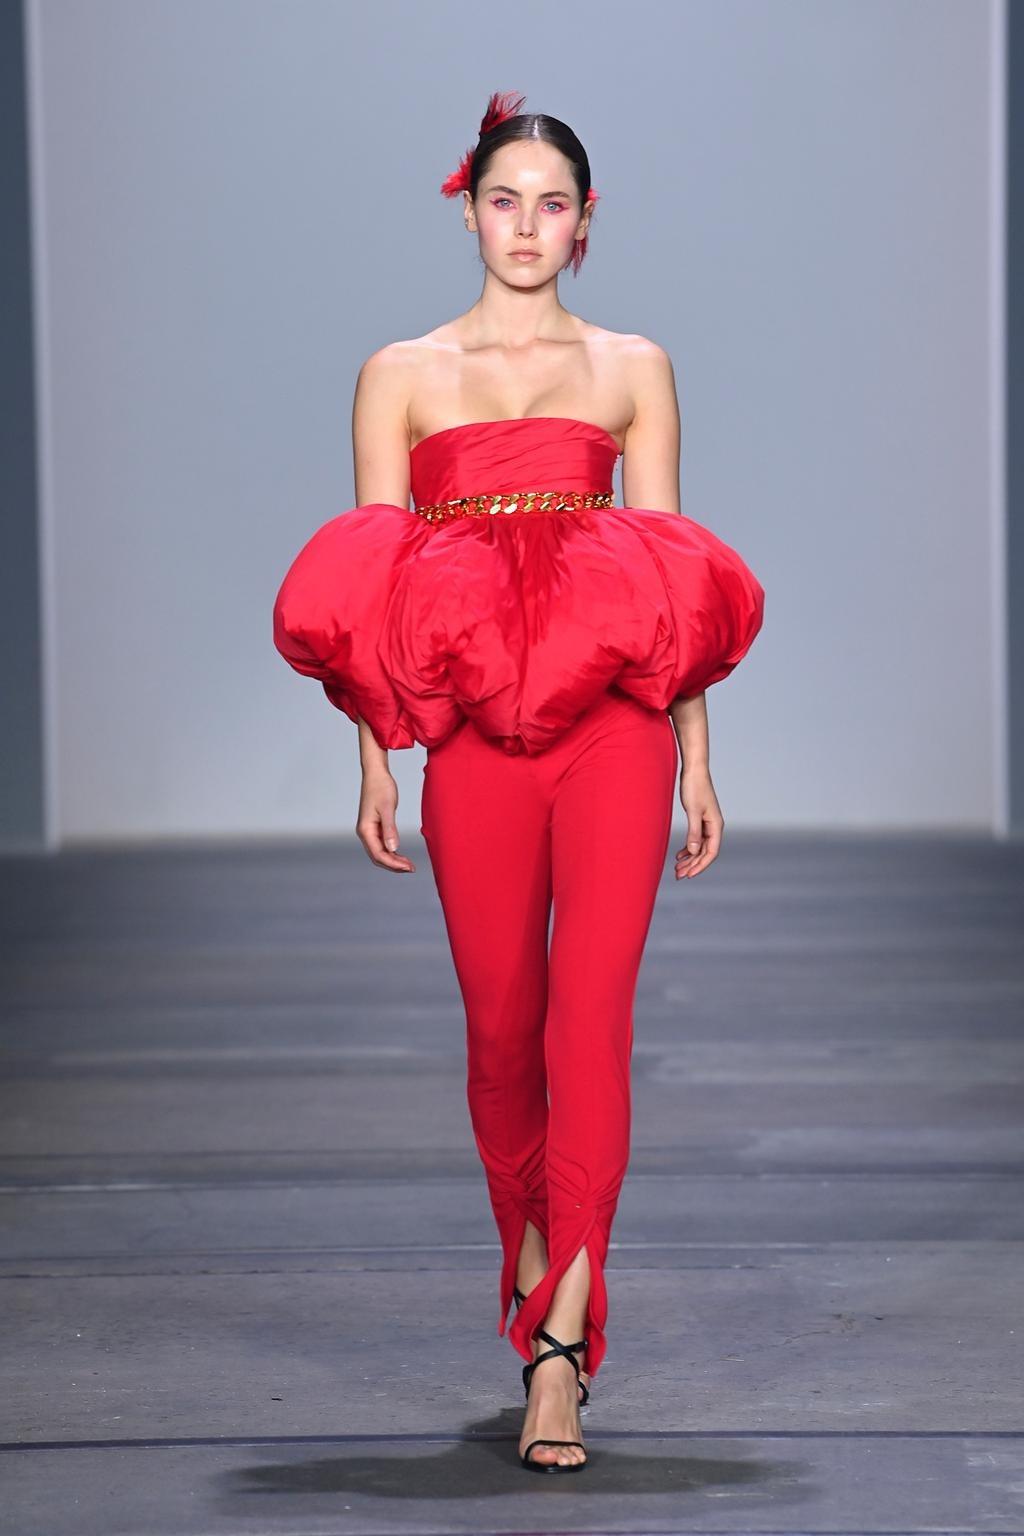 Emma Macgowan walks for Yousef Akbar at Australian Fashion Week | Pride Models news